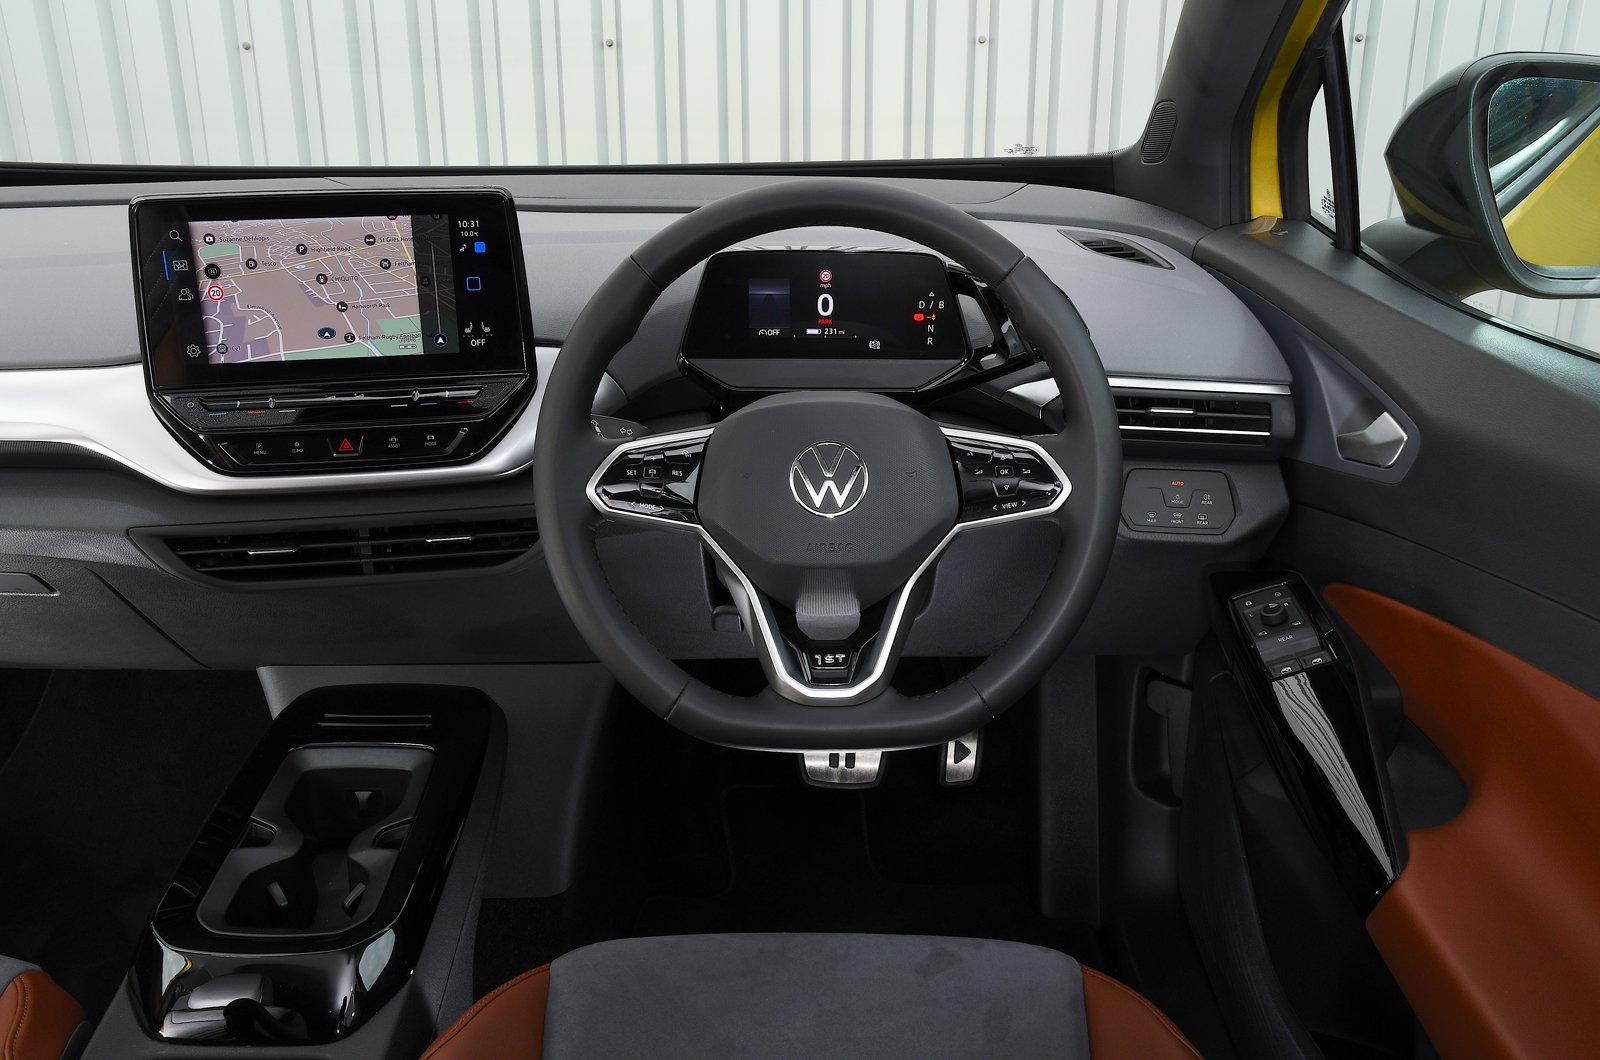 Volkswagen ID.4 2021 dashboard